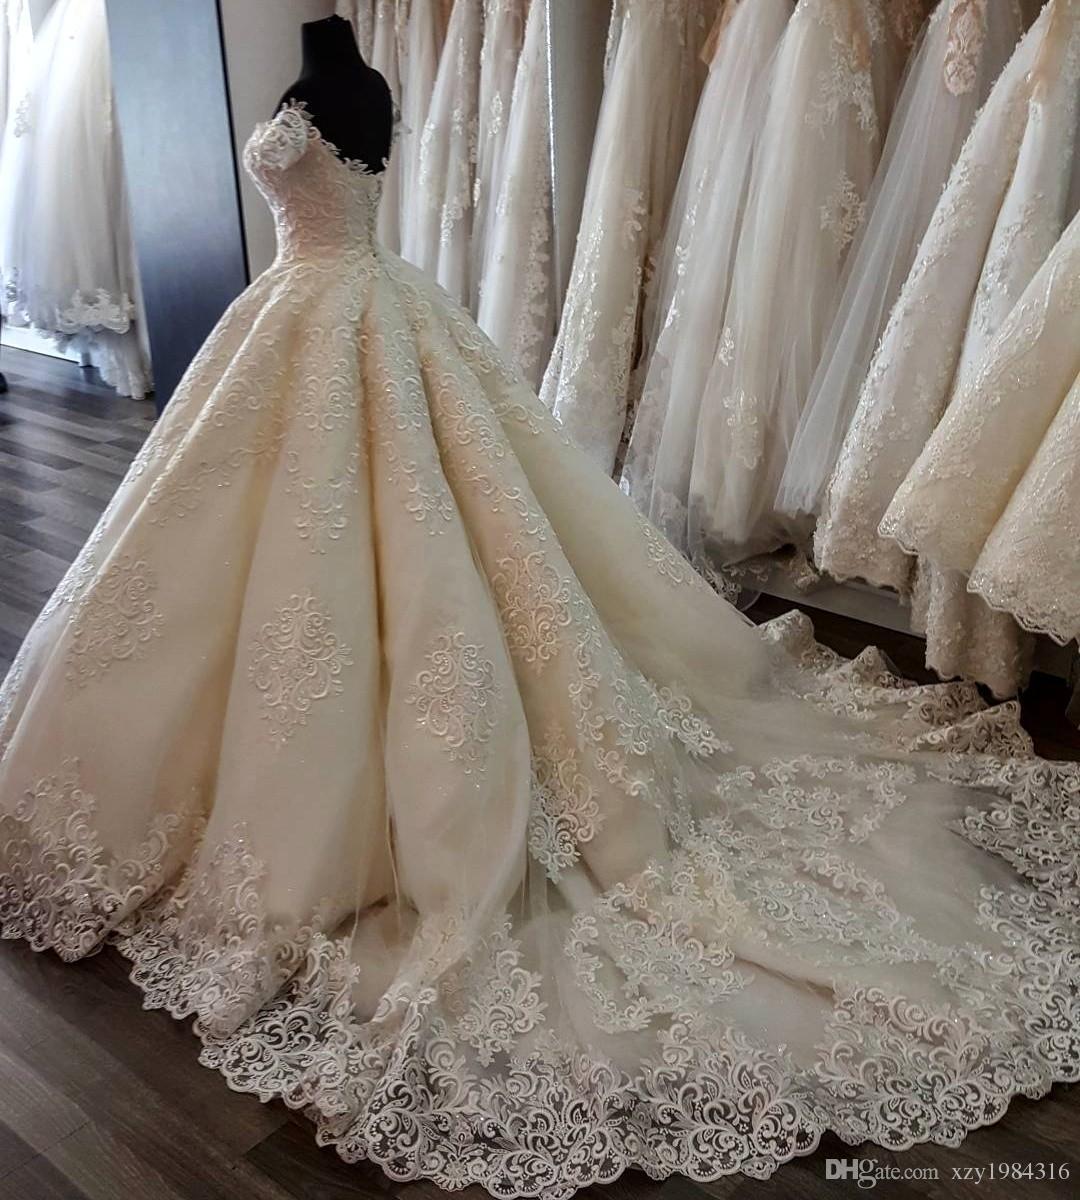 Elegant Short Sleeves Wedding Dress With Appliques Sweetheart Open Back Tulle Long Wedding Gowns 2017 Custom Made Glamorous Bridal Dresses